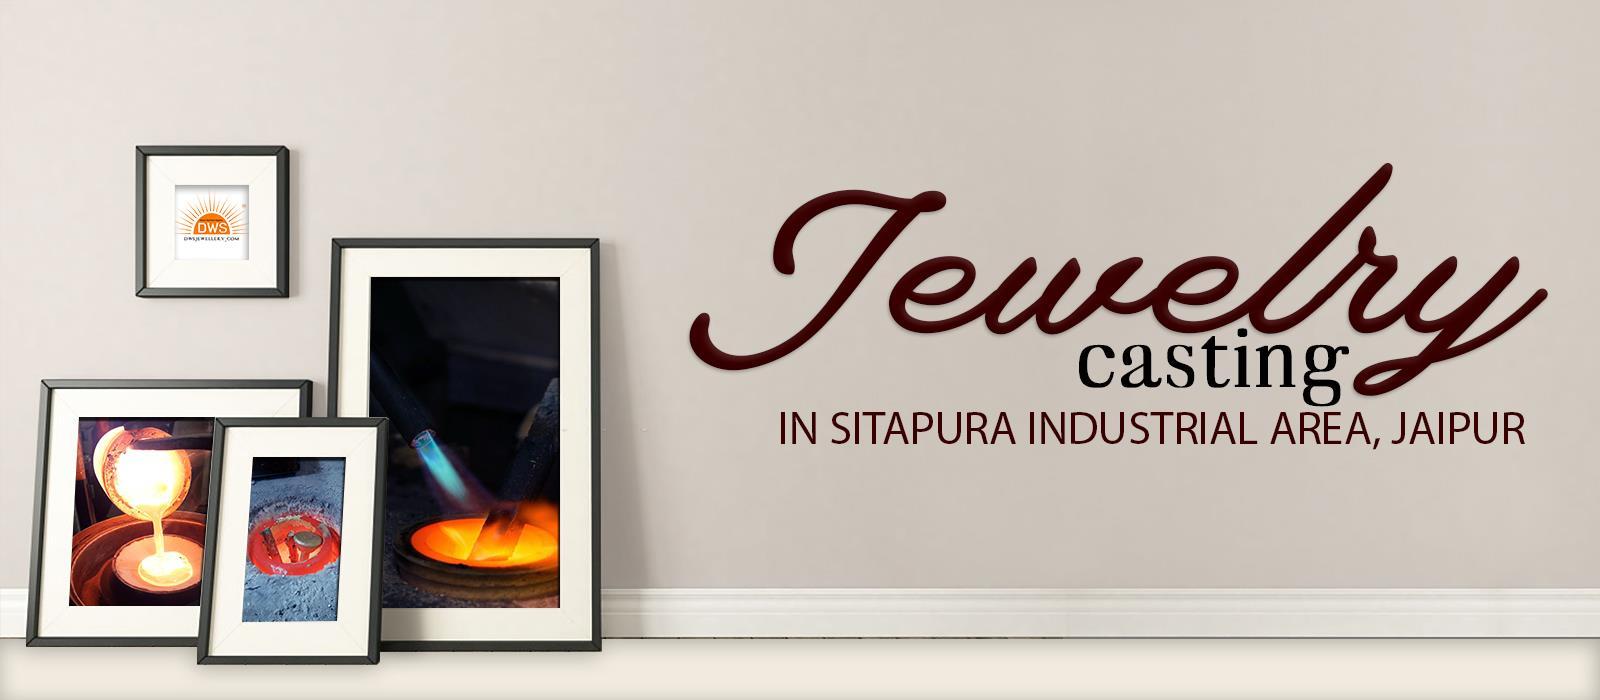 Jewelry Casting in Sitapura Industrial Area Jaipur